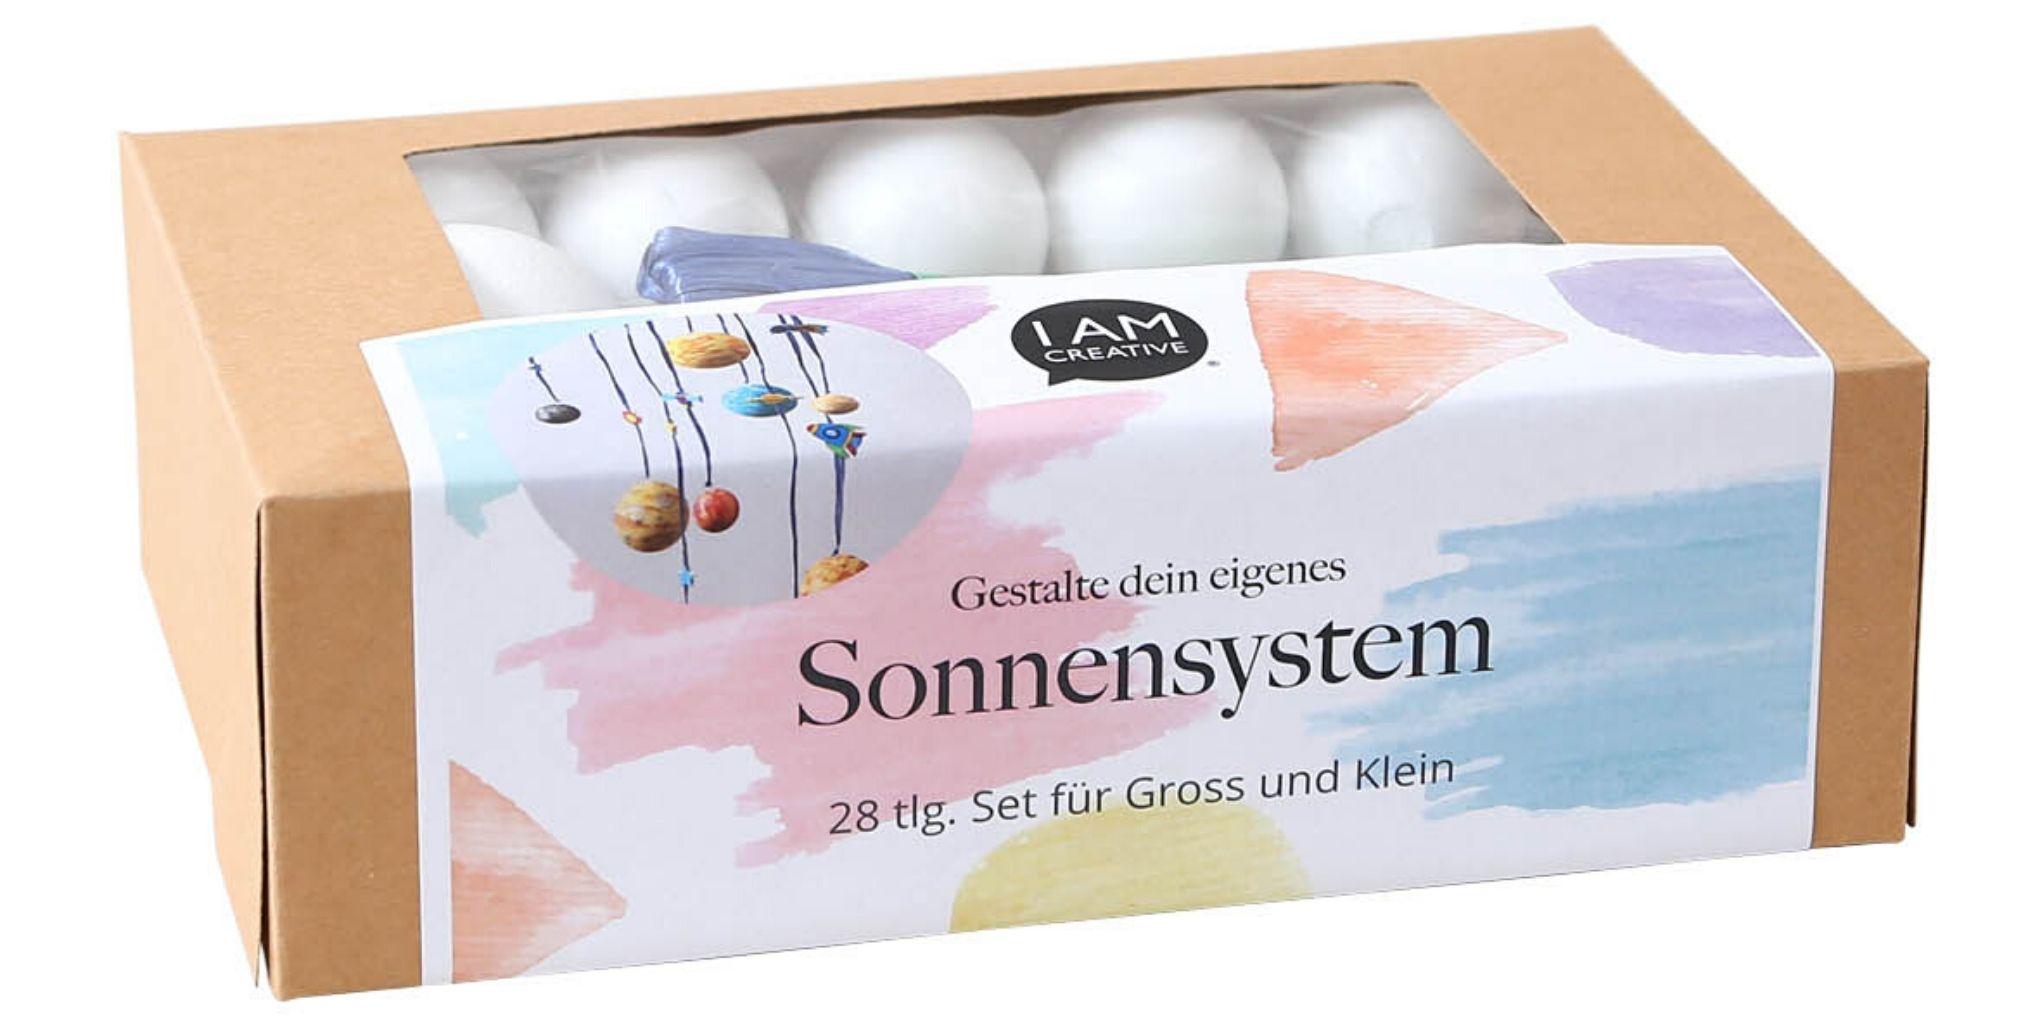 Sonnensystem Box